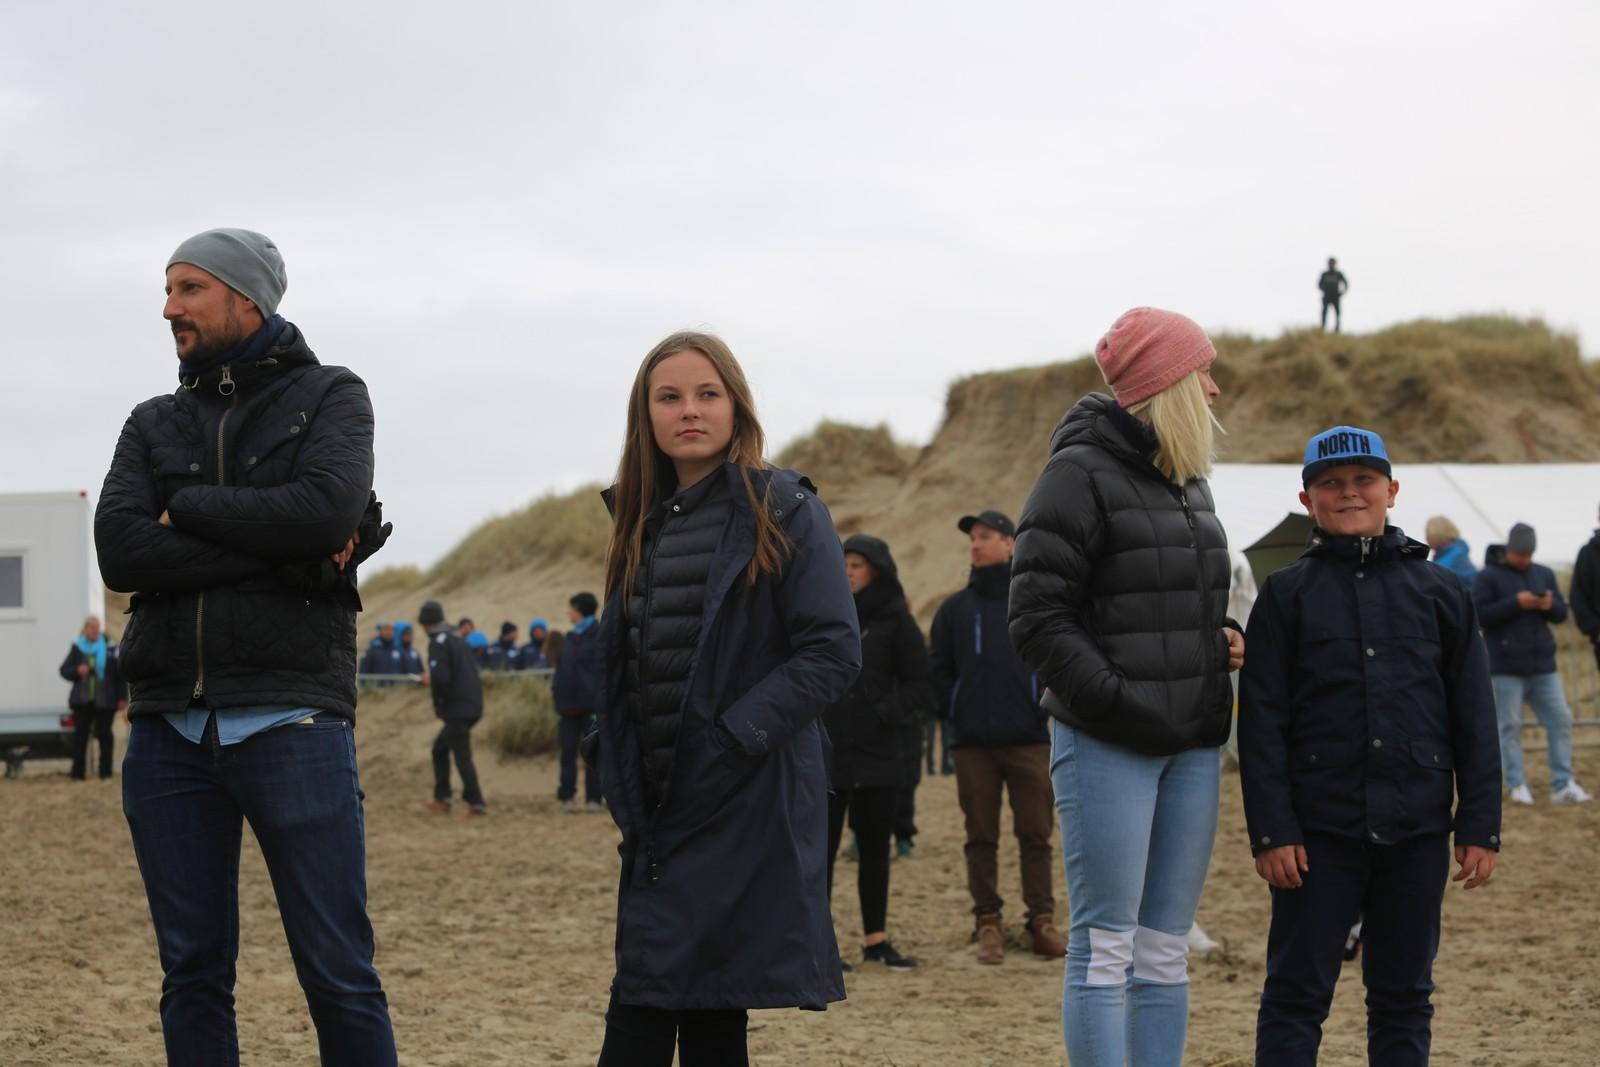 H.K.H Kronprins Haakon Magnus besøkte Borestranden under EM i surfing på lørdag. Her sammen med kronprinsesse Mette Marit og barna Ingrid Alexandra og Sverre Magnus.